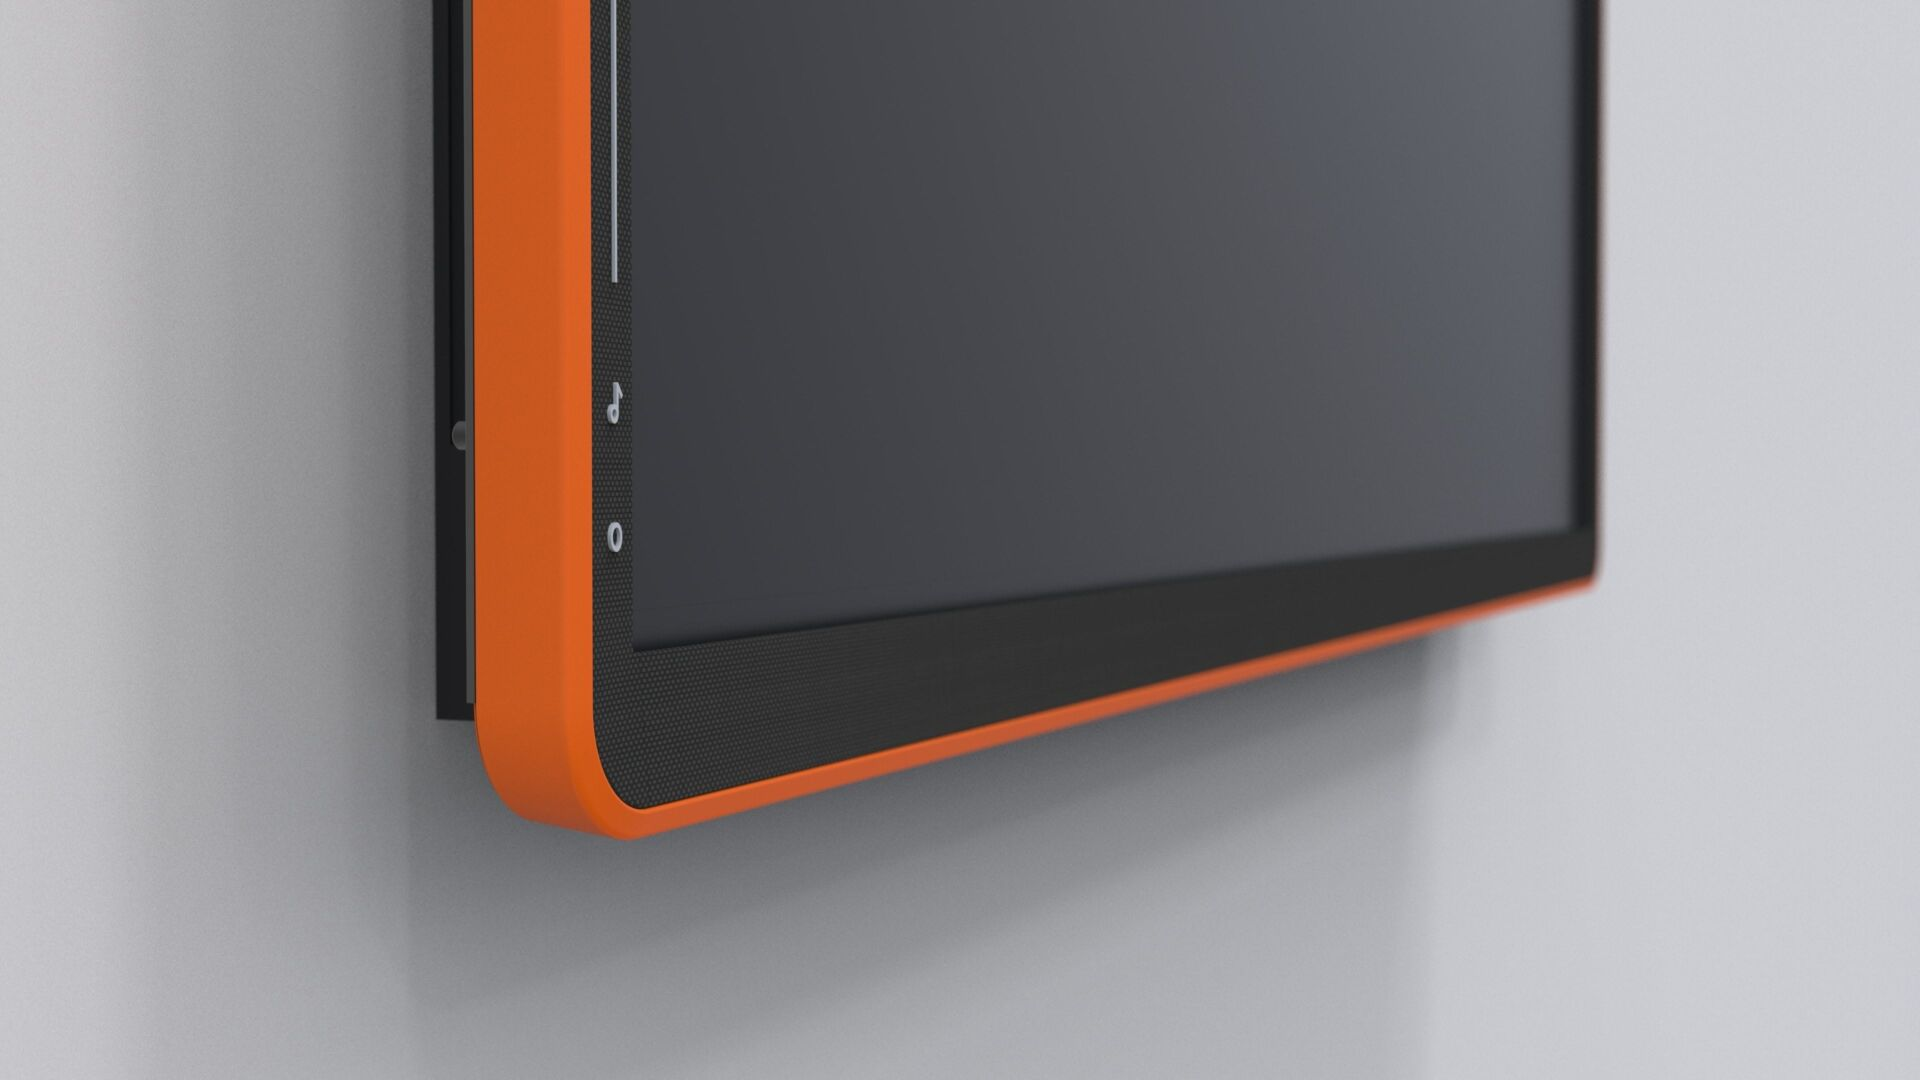 Angle Depth of Field Regal Orange